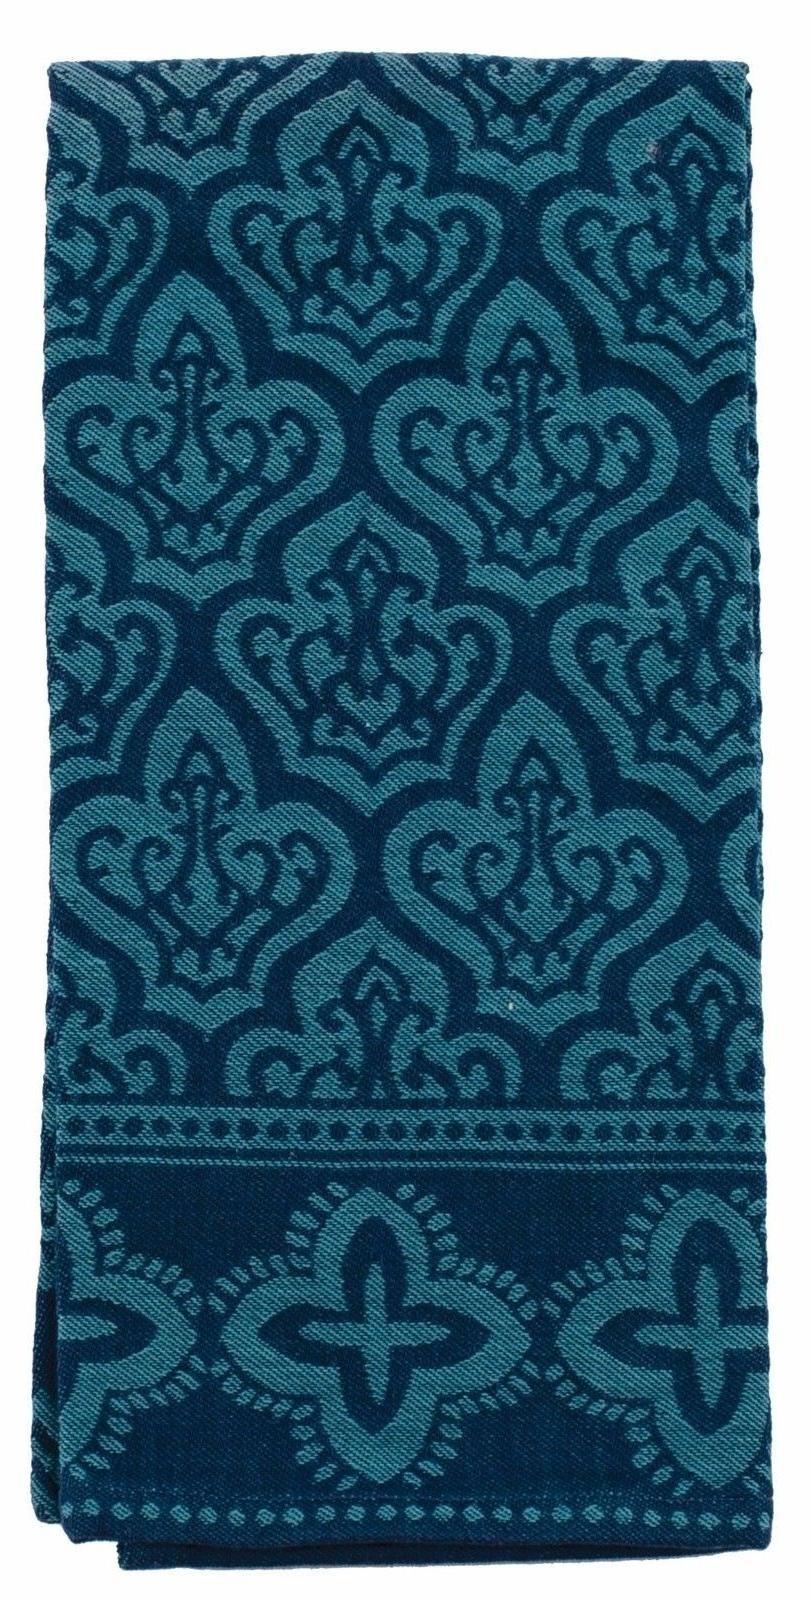 Kay Dee Designs Jacquard Tea Towel Indigold XL Cotton 18x28